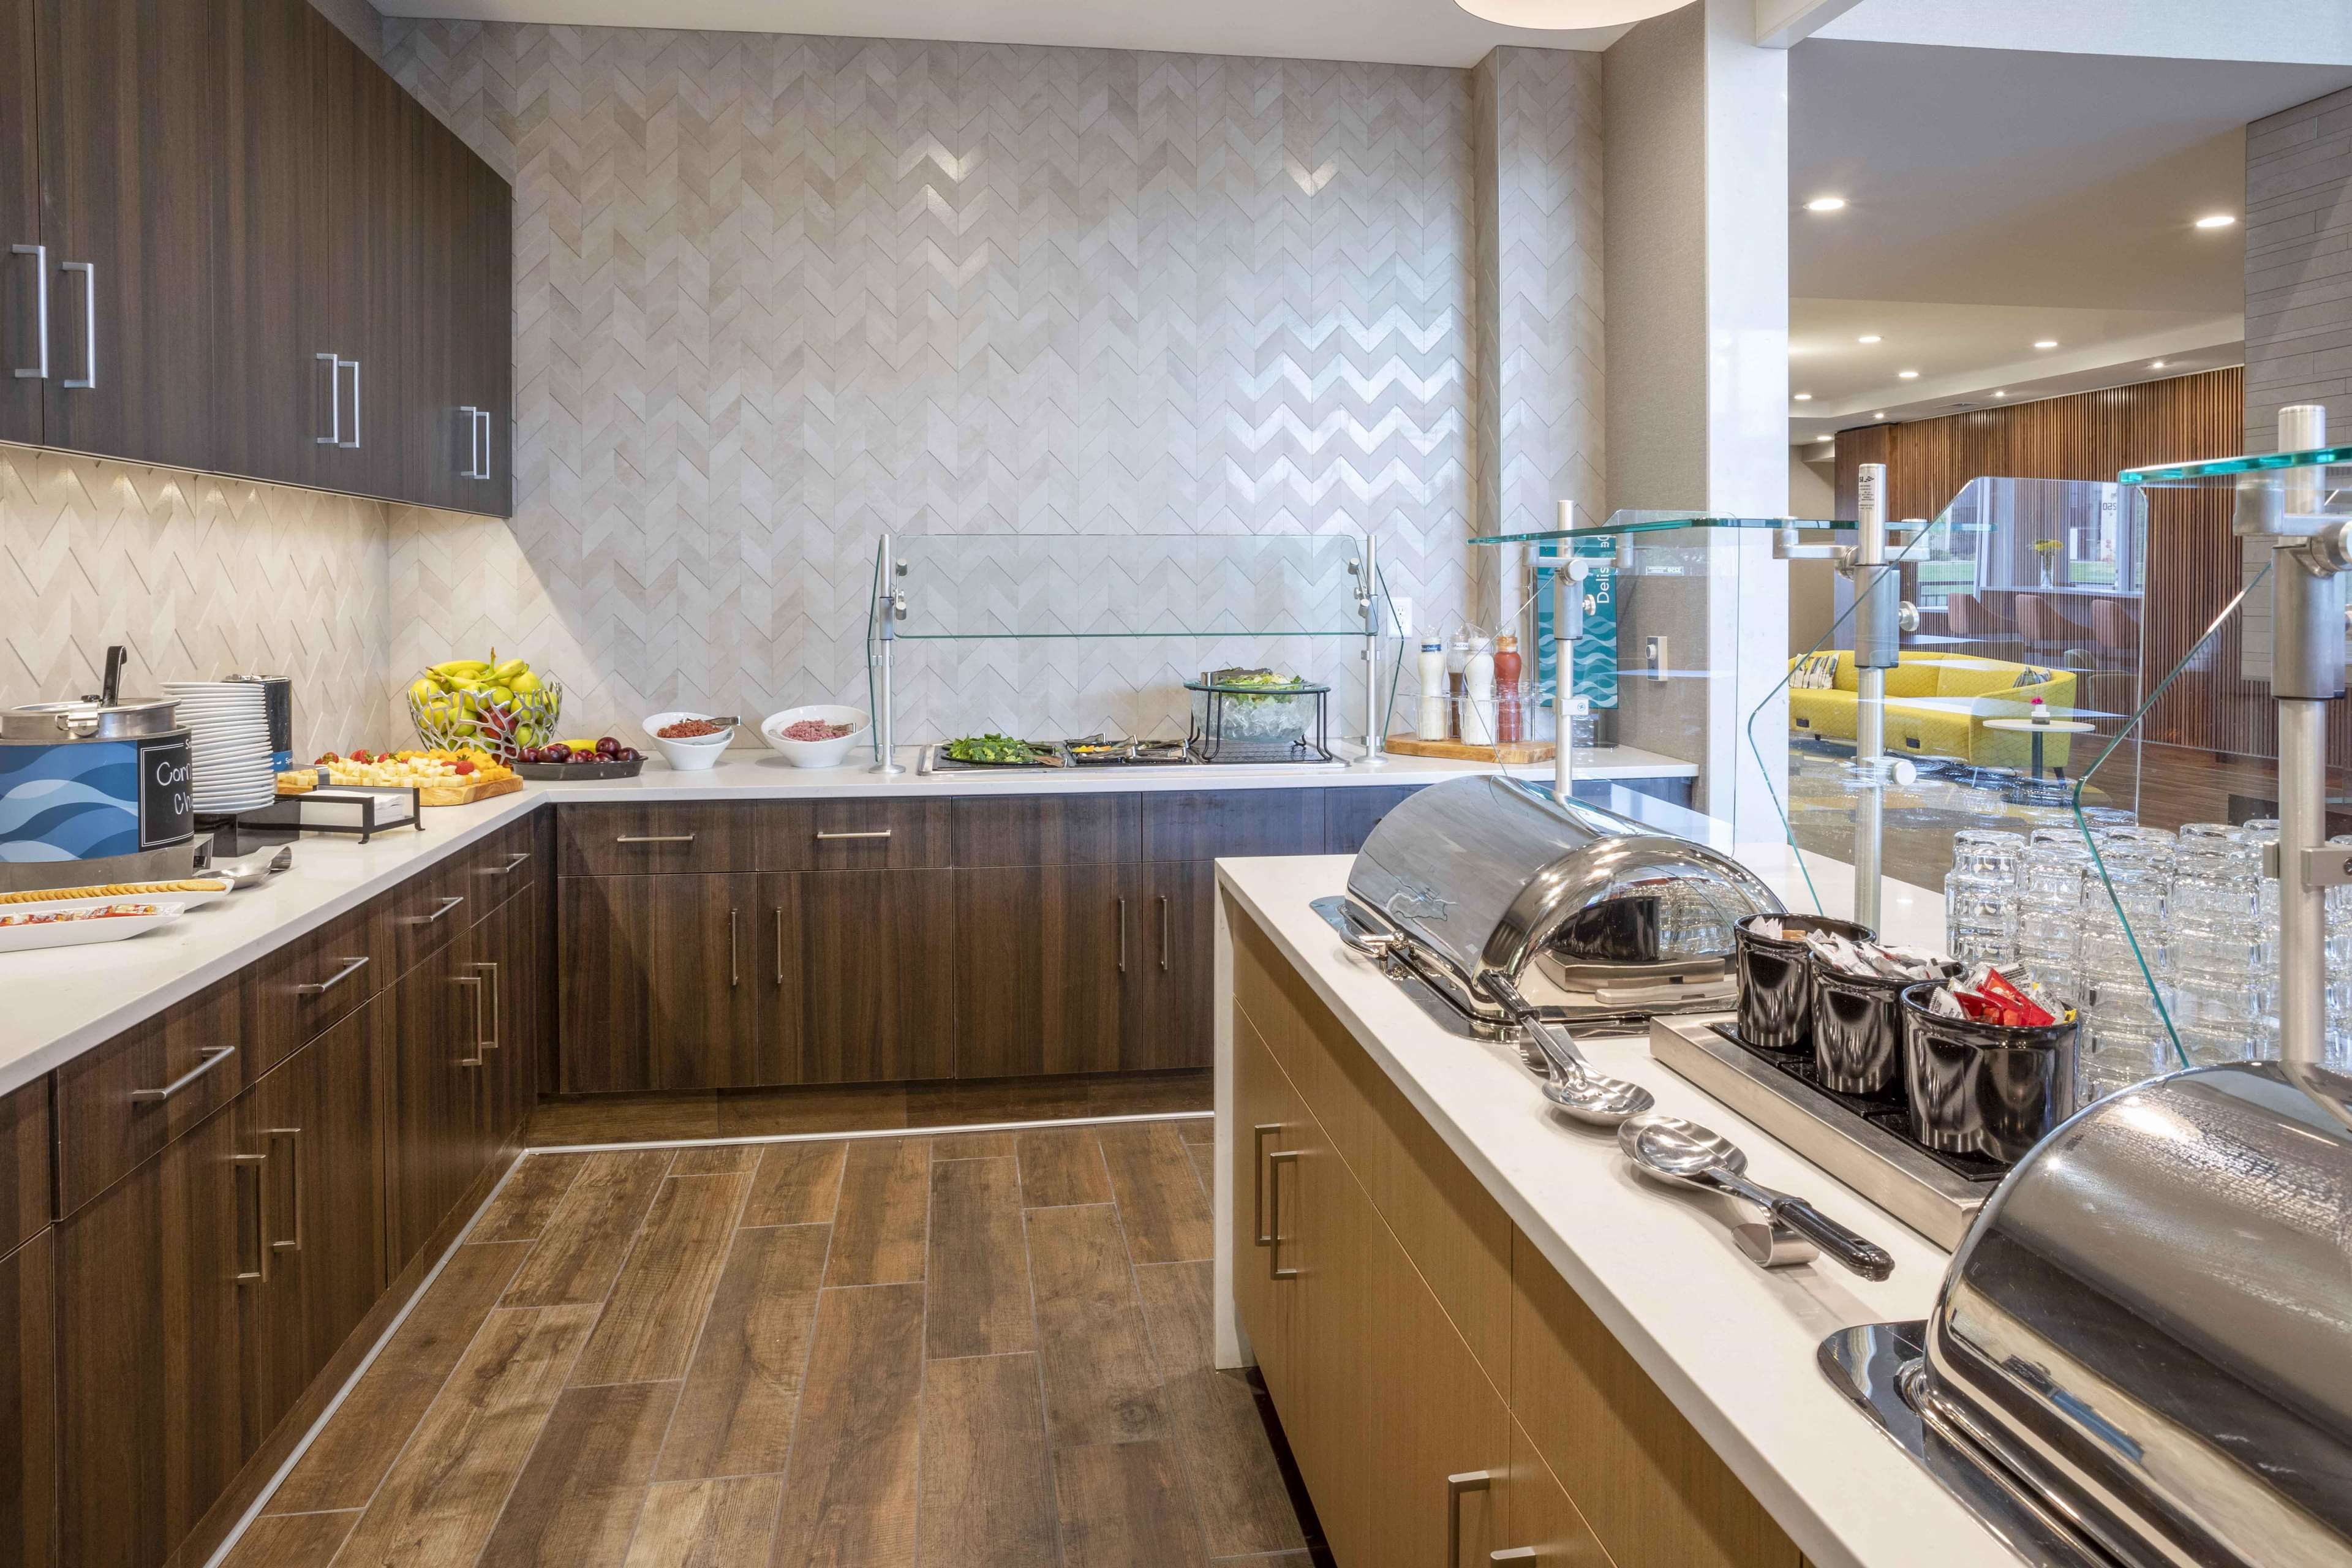 Homewood Suites by Hilton Edina Minneapolis image 10